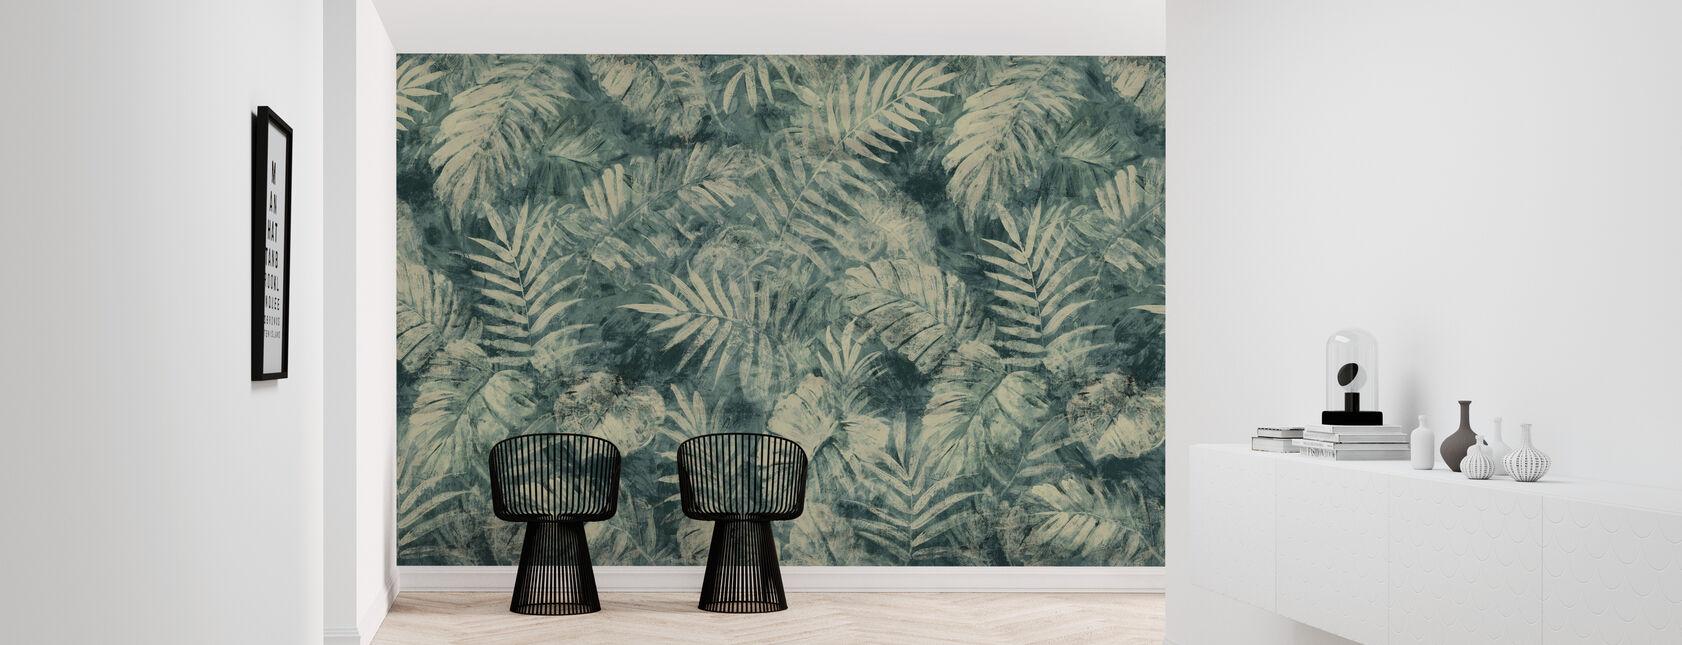 Vegetables - Wallpaper - Hallway